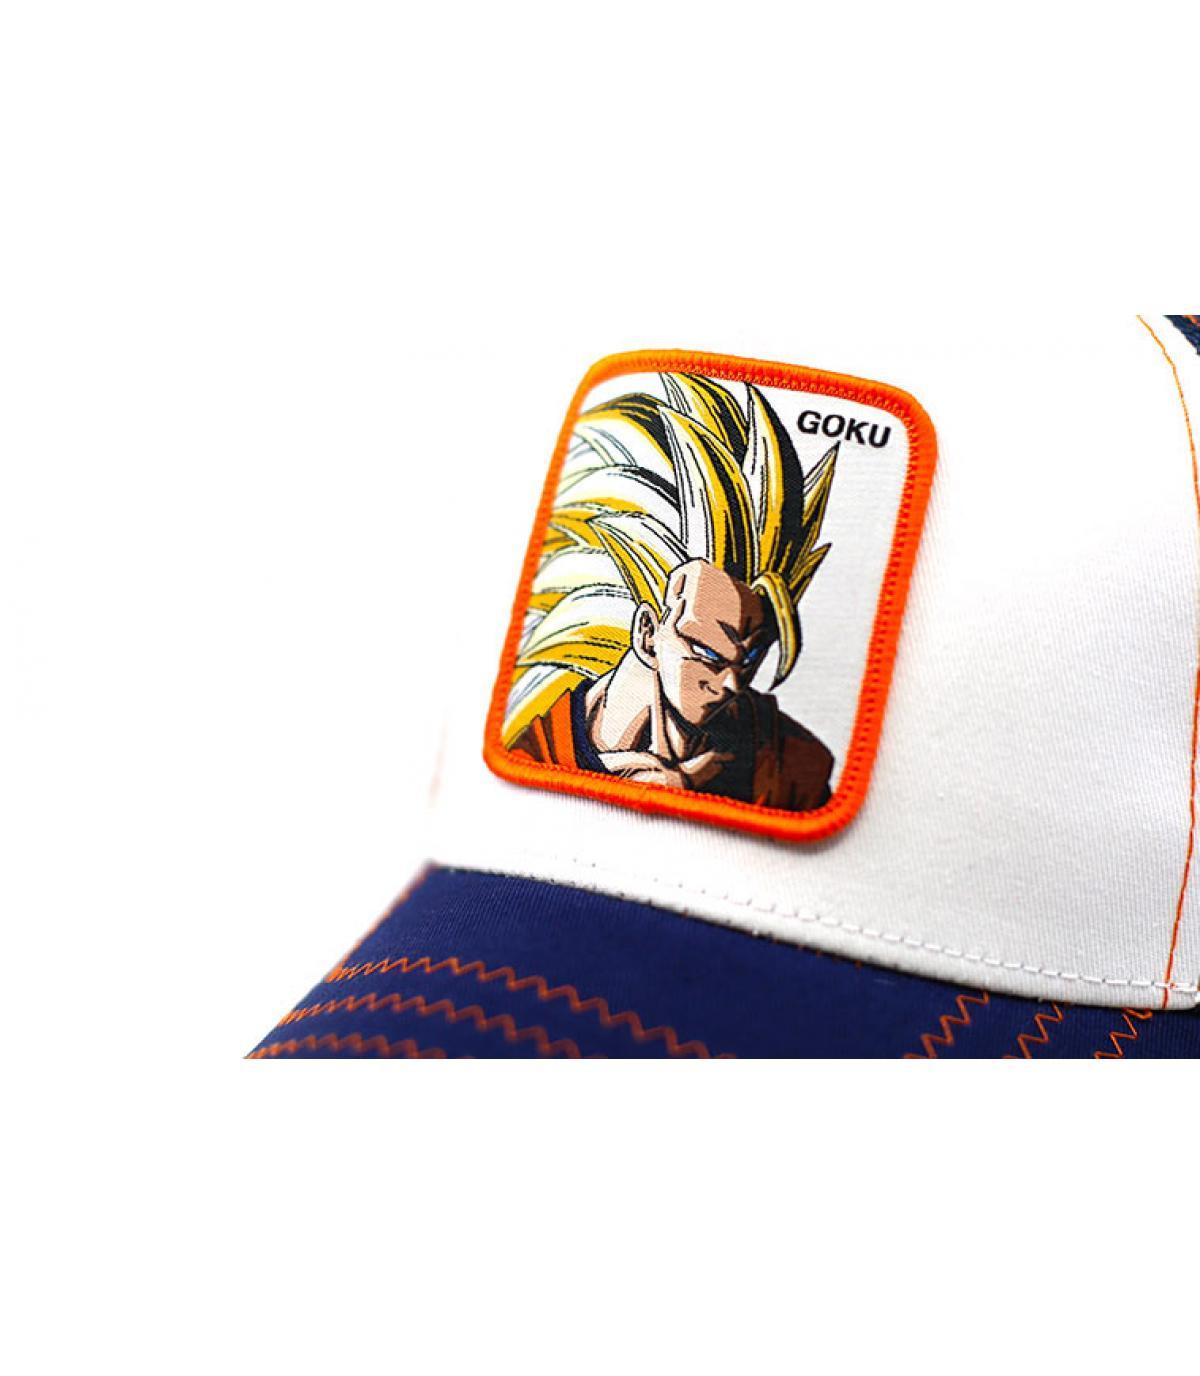 Details Trucker Son Goku Super Sayen 3 - Abbildung 3